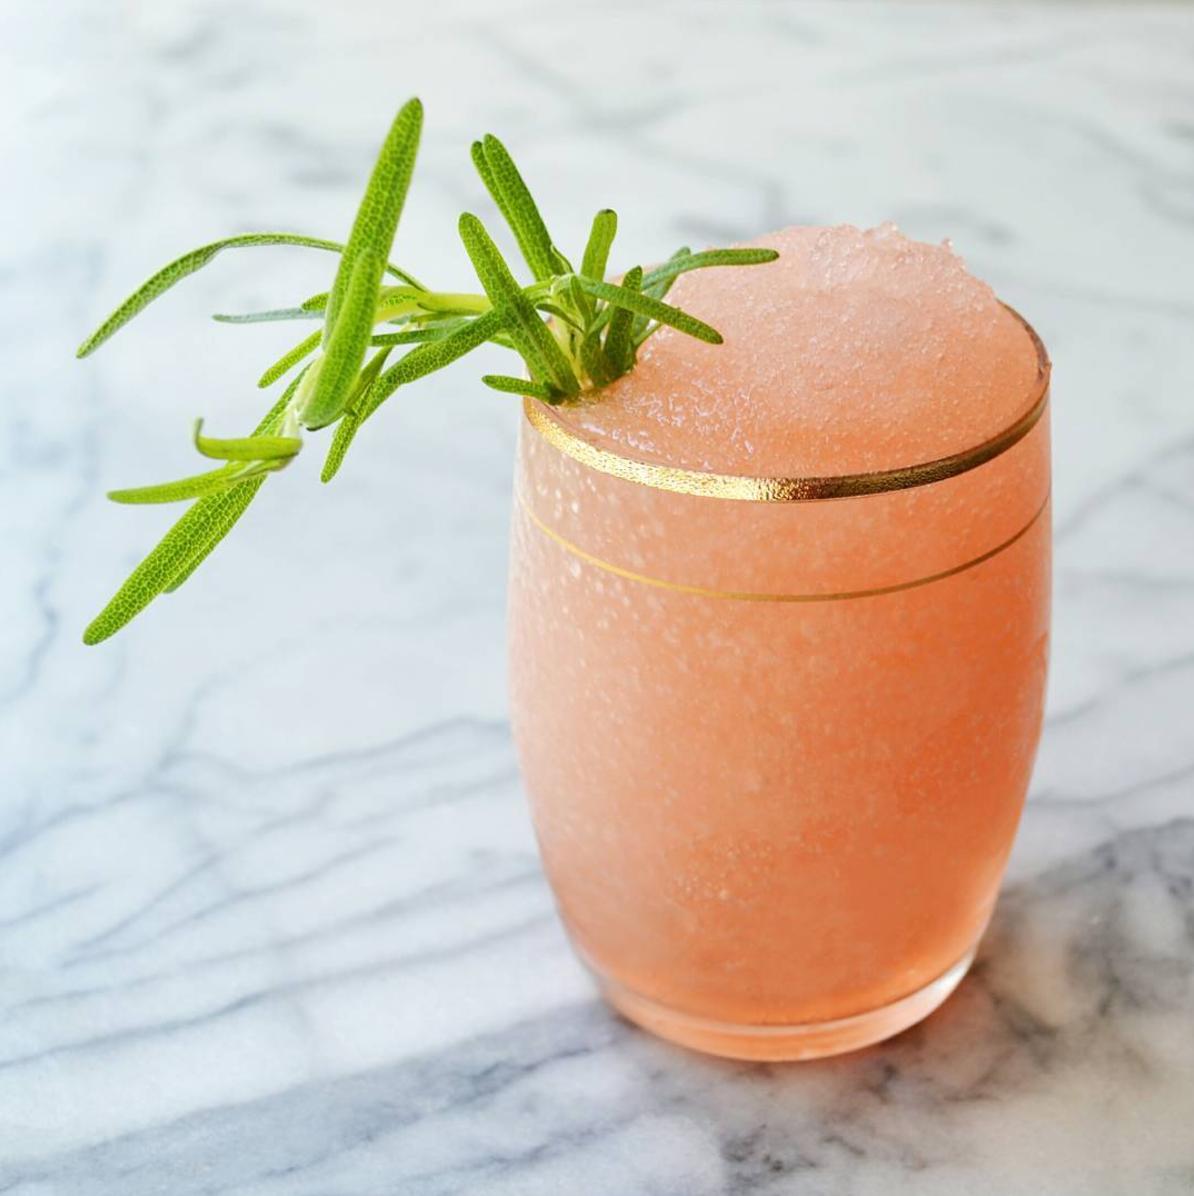 Frosé mary    1 bottle of rosé   Ice   3 oz strawberry simple syrup    3 oz freshly-squeezed lemon juice   Fresh rosemary garnish